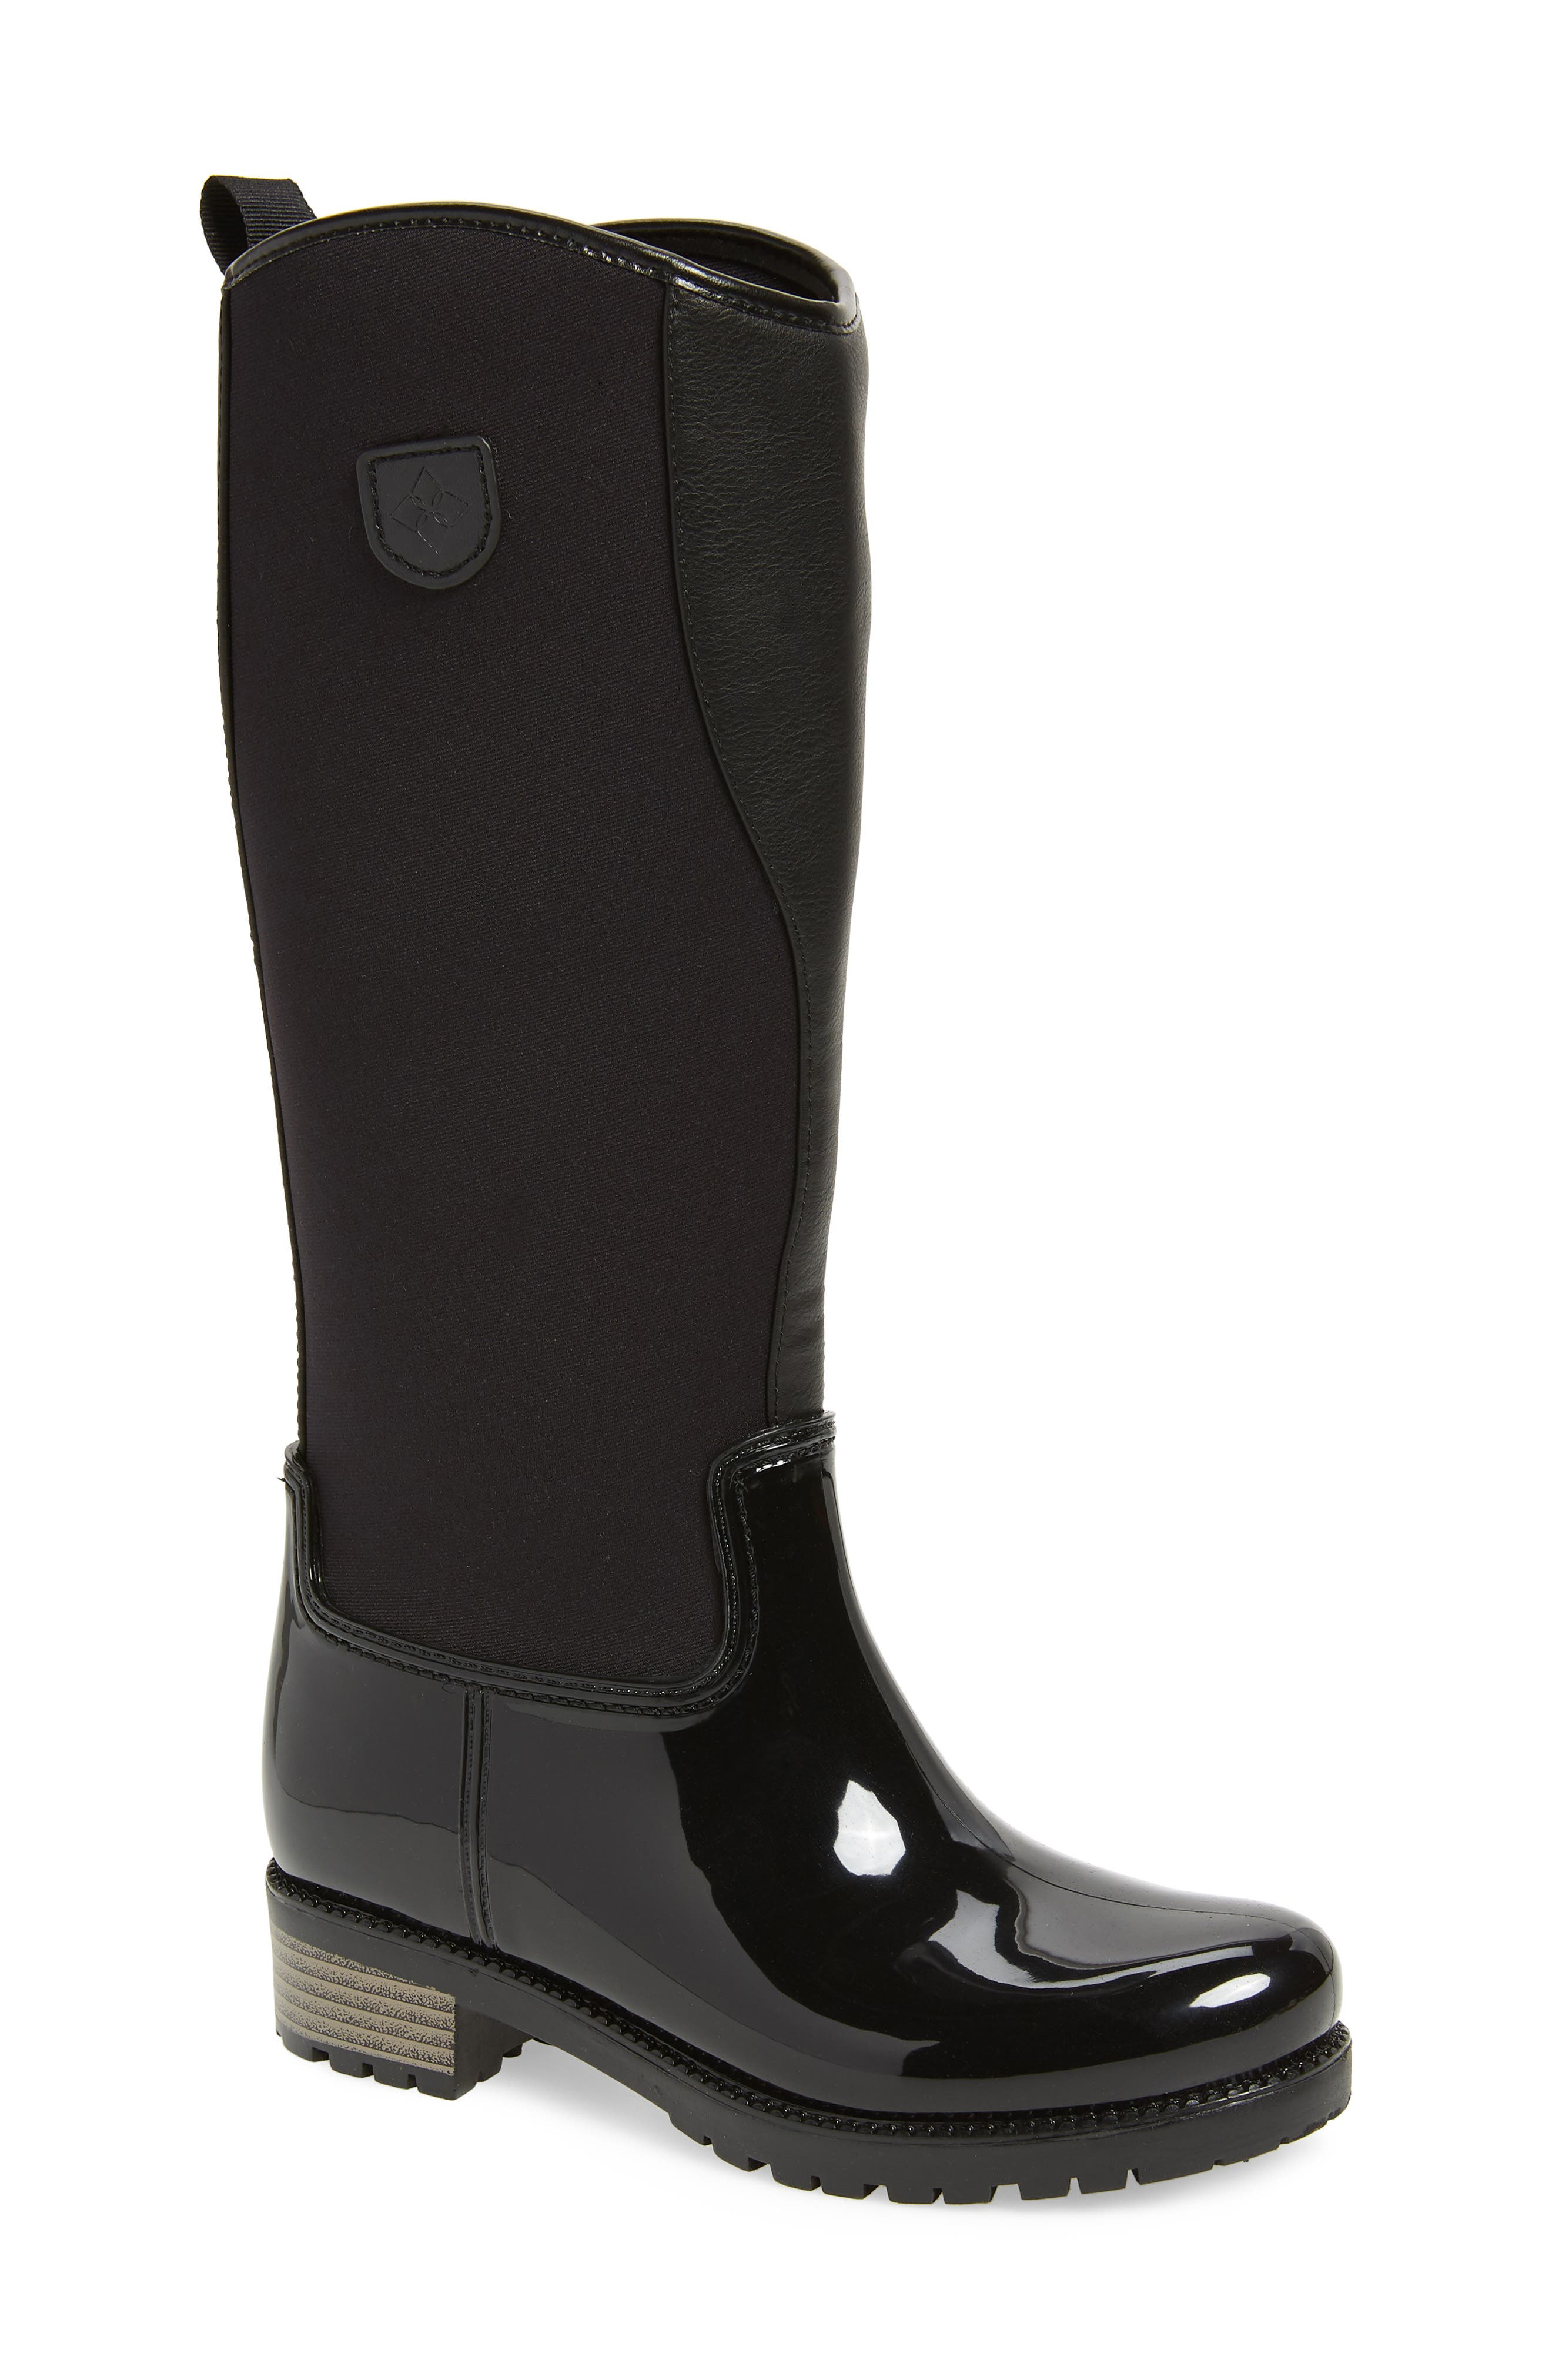 Parma 2 Tall Waterproof Rain Boot,                         Main,                         color, BLACK FABRIC